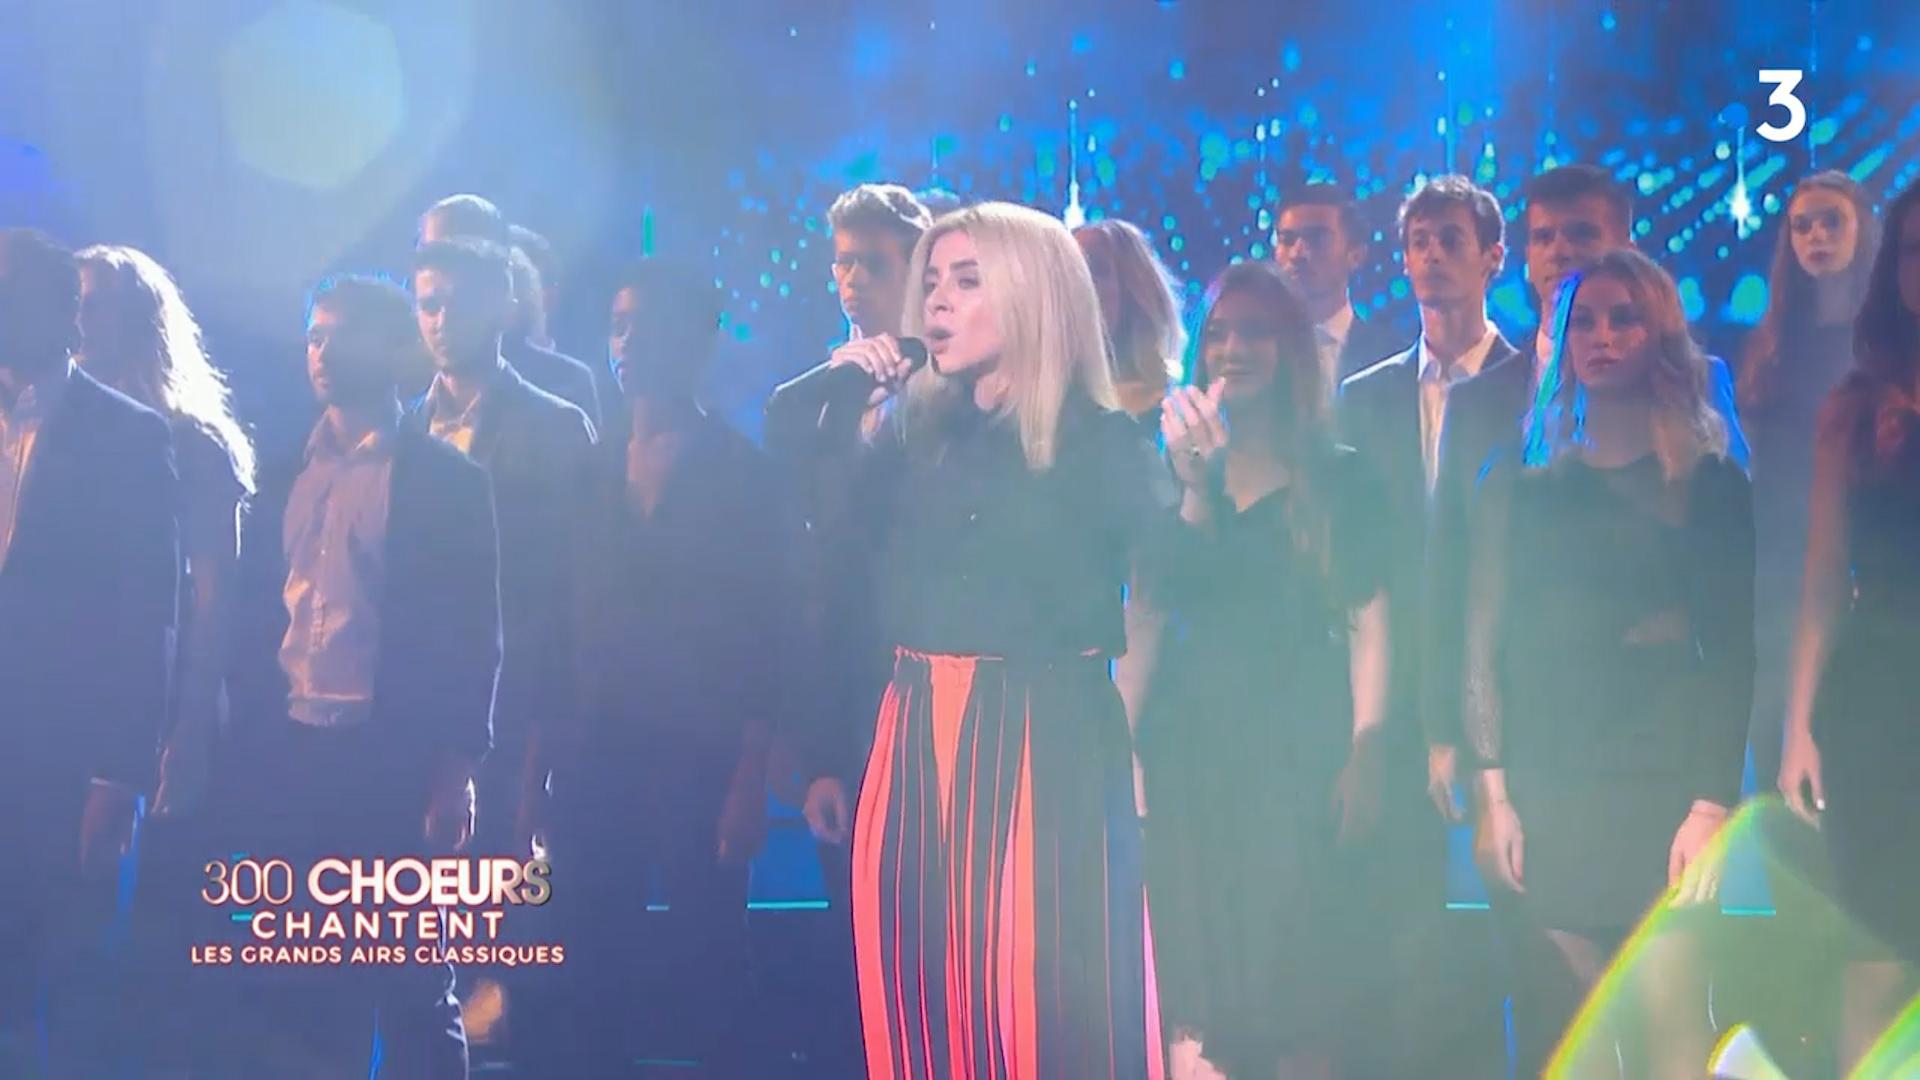 300 choeurs chantent (22/11)